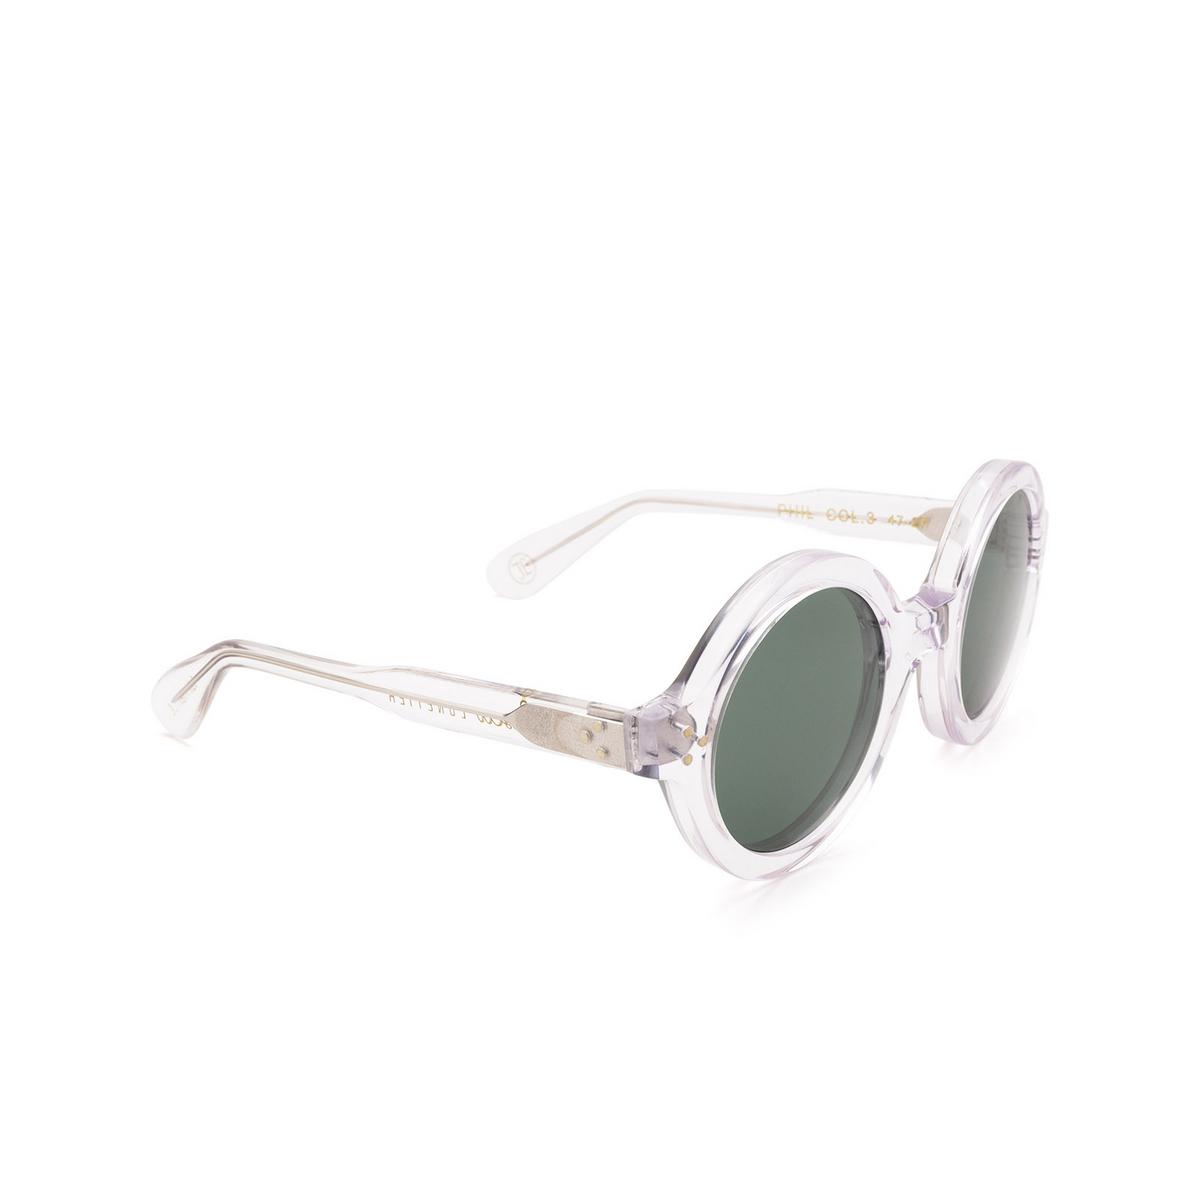 Lesca® Round Sunglasses: Phil Sun color Crystal 3 - three-quarters view.